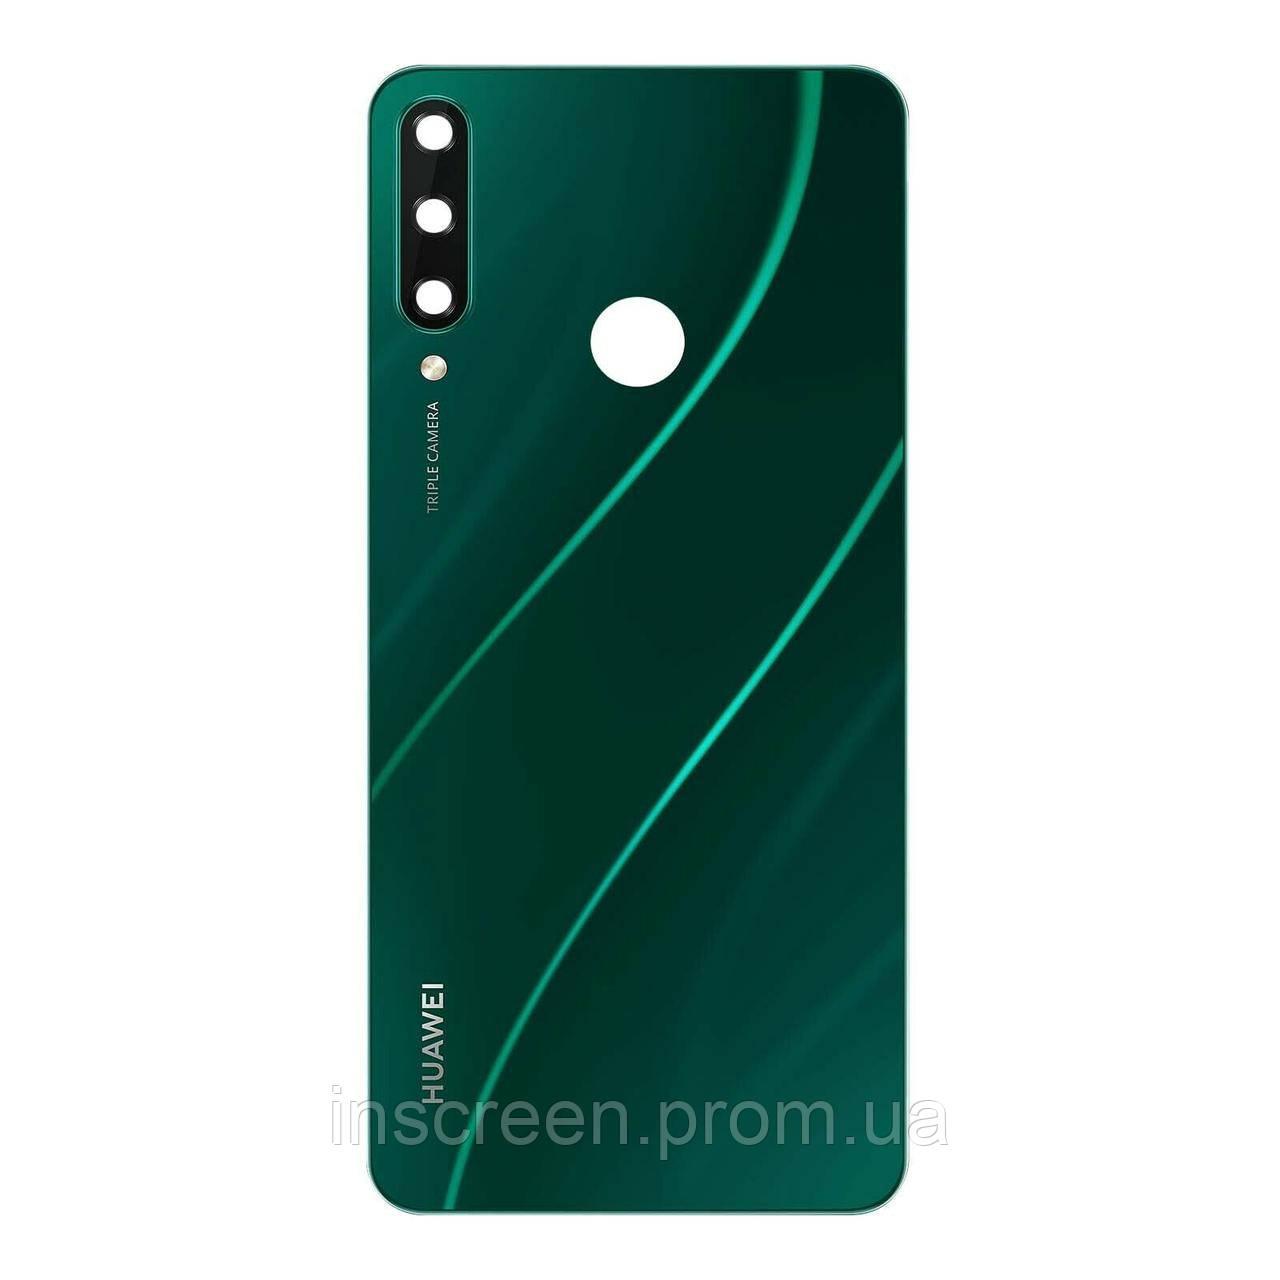 Задня кришка Huawei Y6p 2020 MED-LX9, MOA-LX9N, зелена, Emerald Green, Оригінал Китай